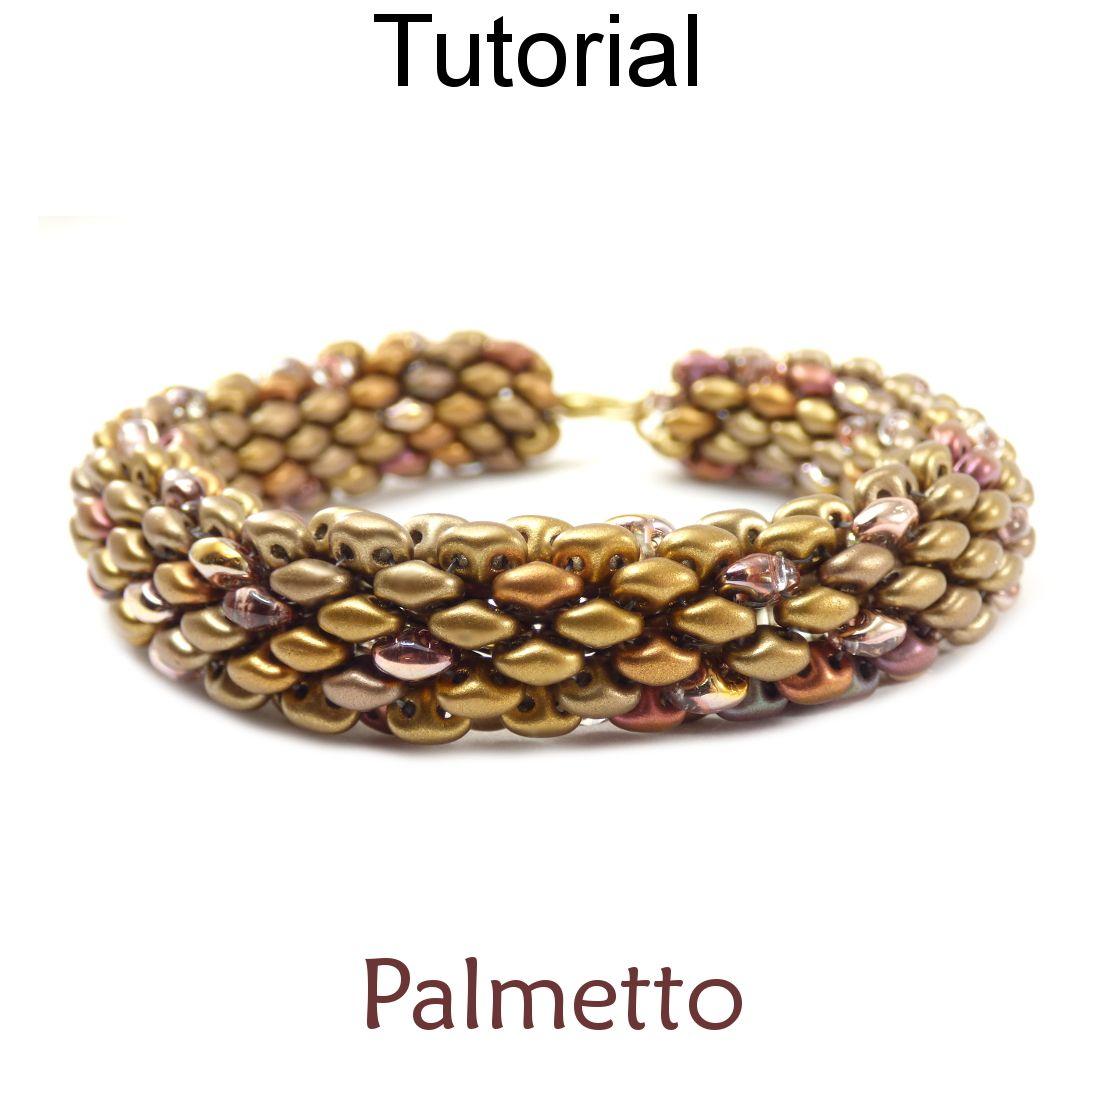 Beaded Tubular SuperDuo Bracelet Necklace Downloadable Beading Pattern Tutorial